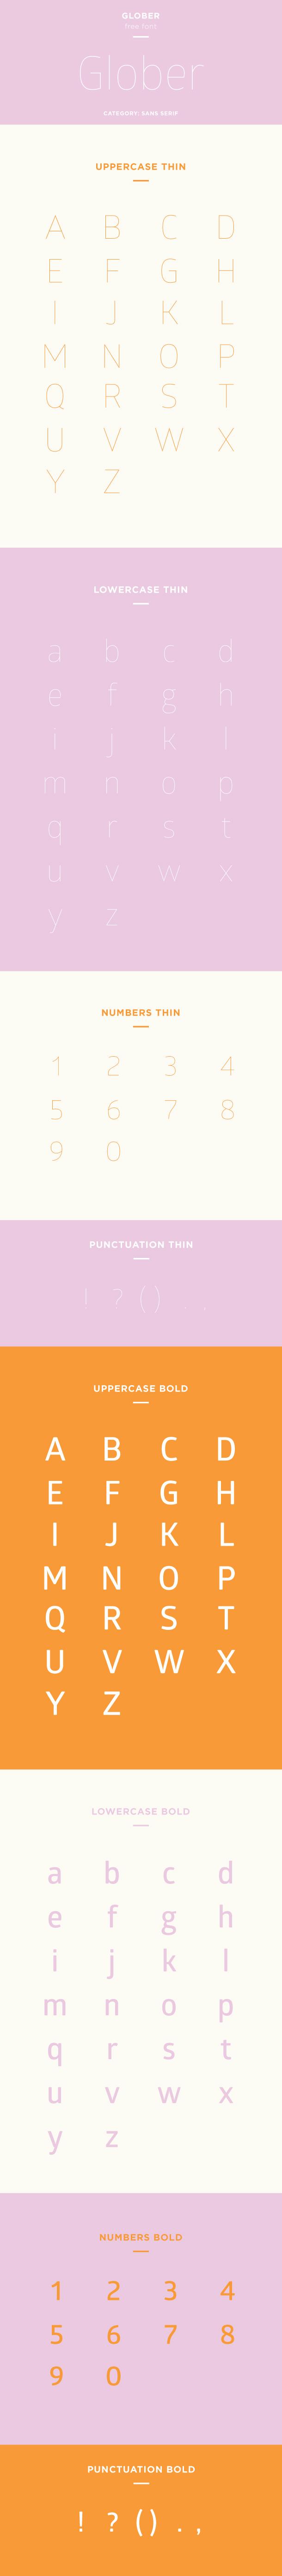 glober font example